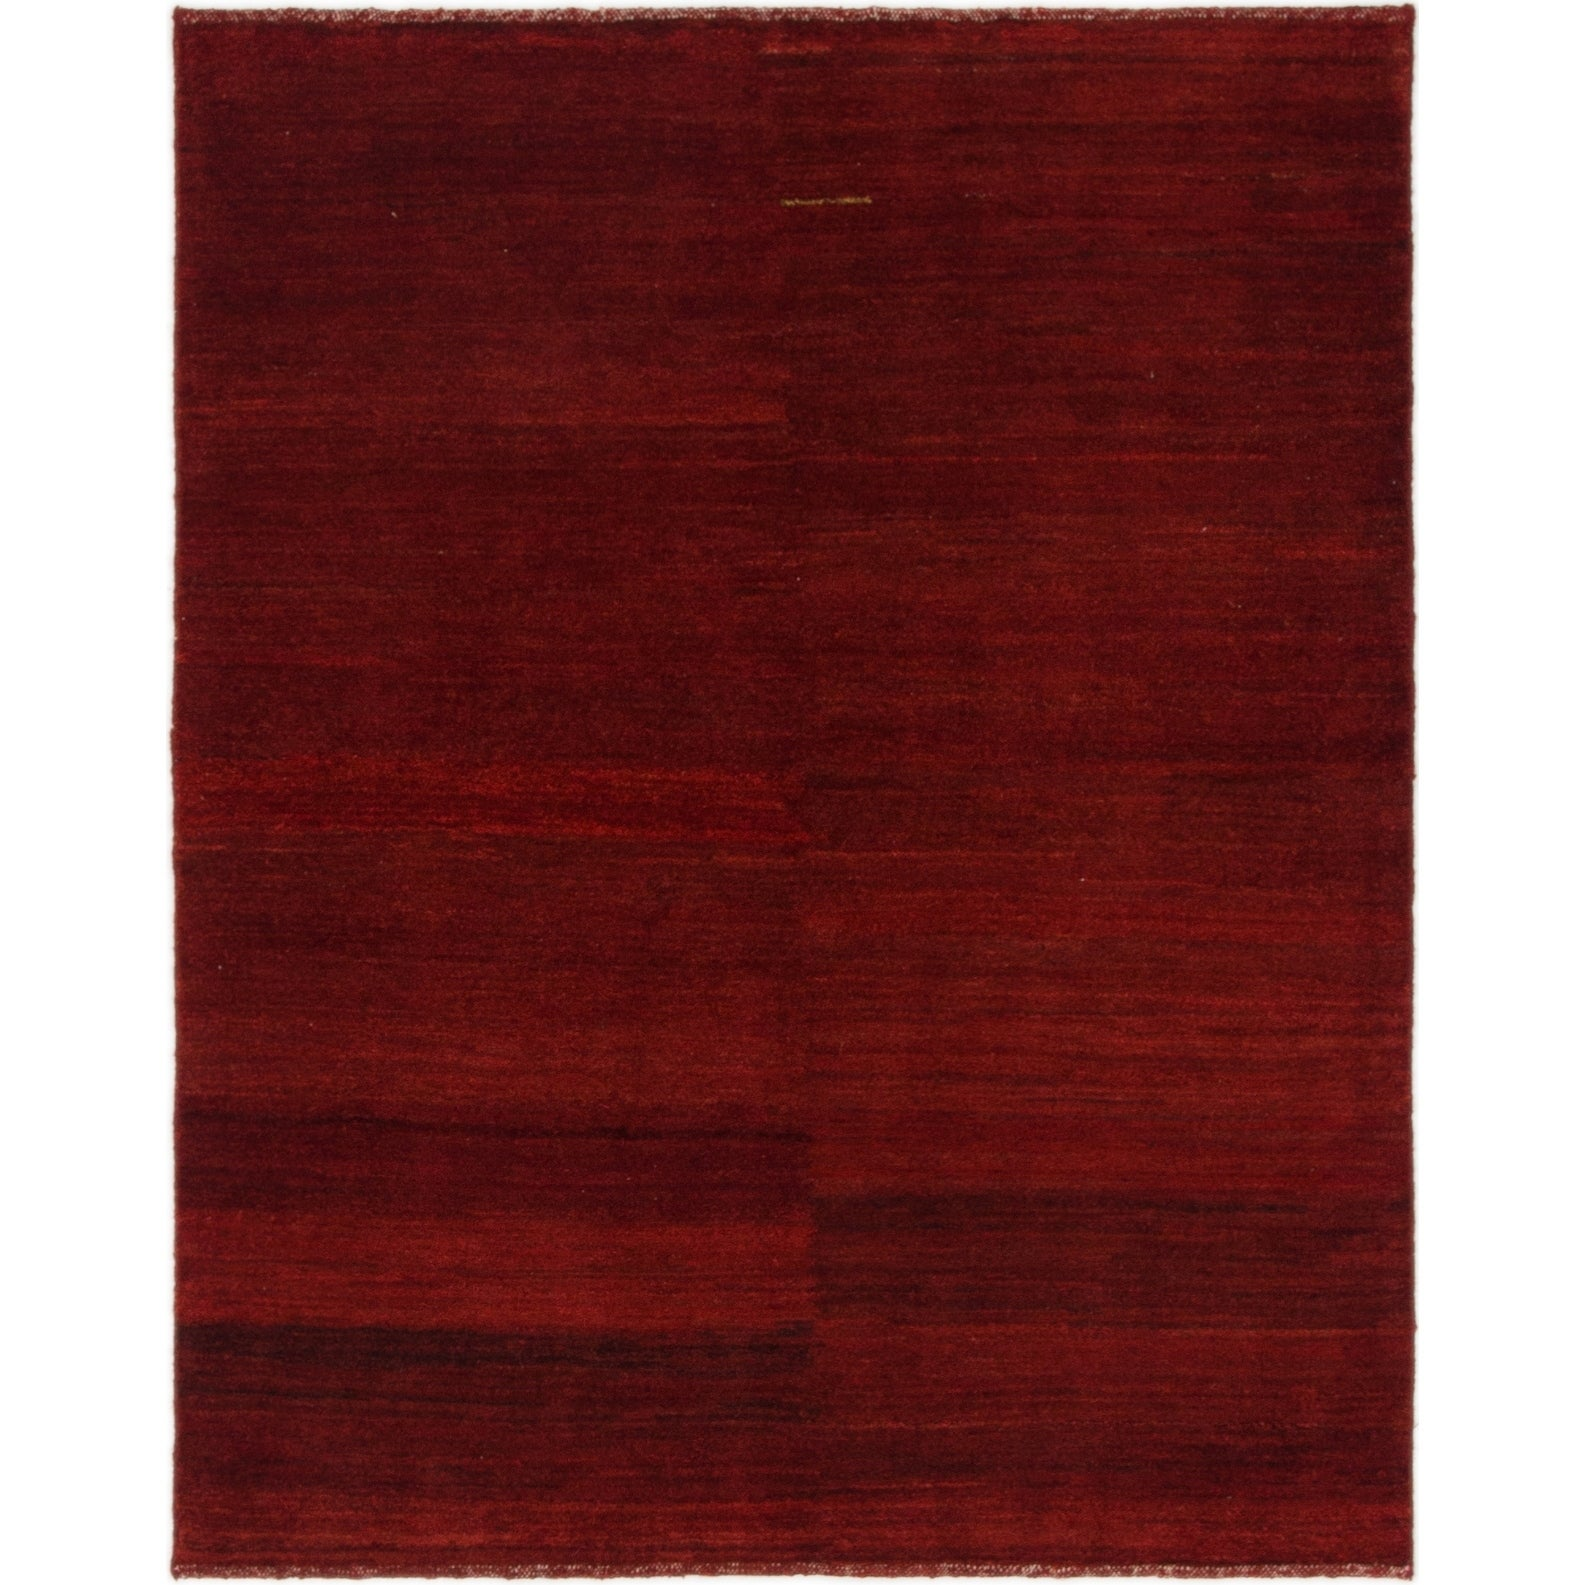 Hand Knotted Kashkuli Gabbeh Wool Area Rug - 4 x 5 1 (Burgundy - 4 x 5 1)